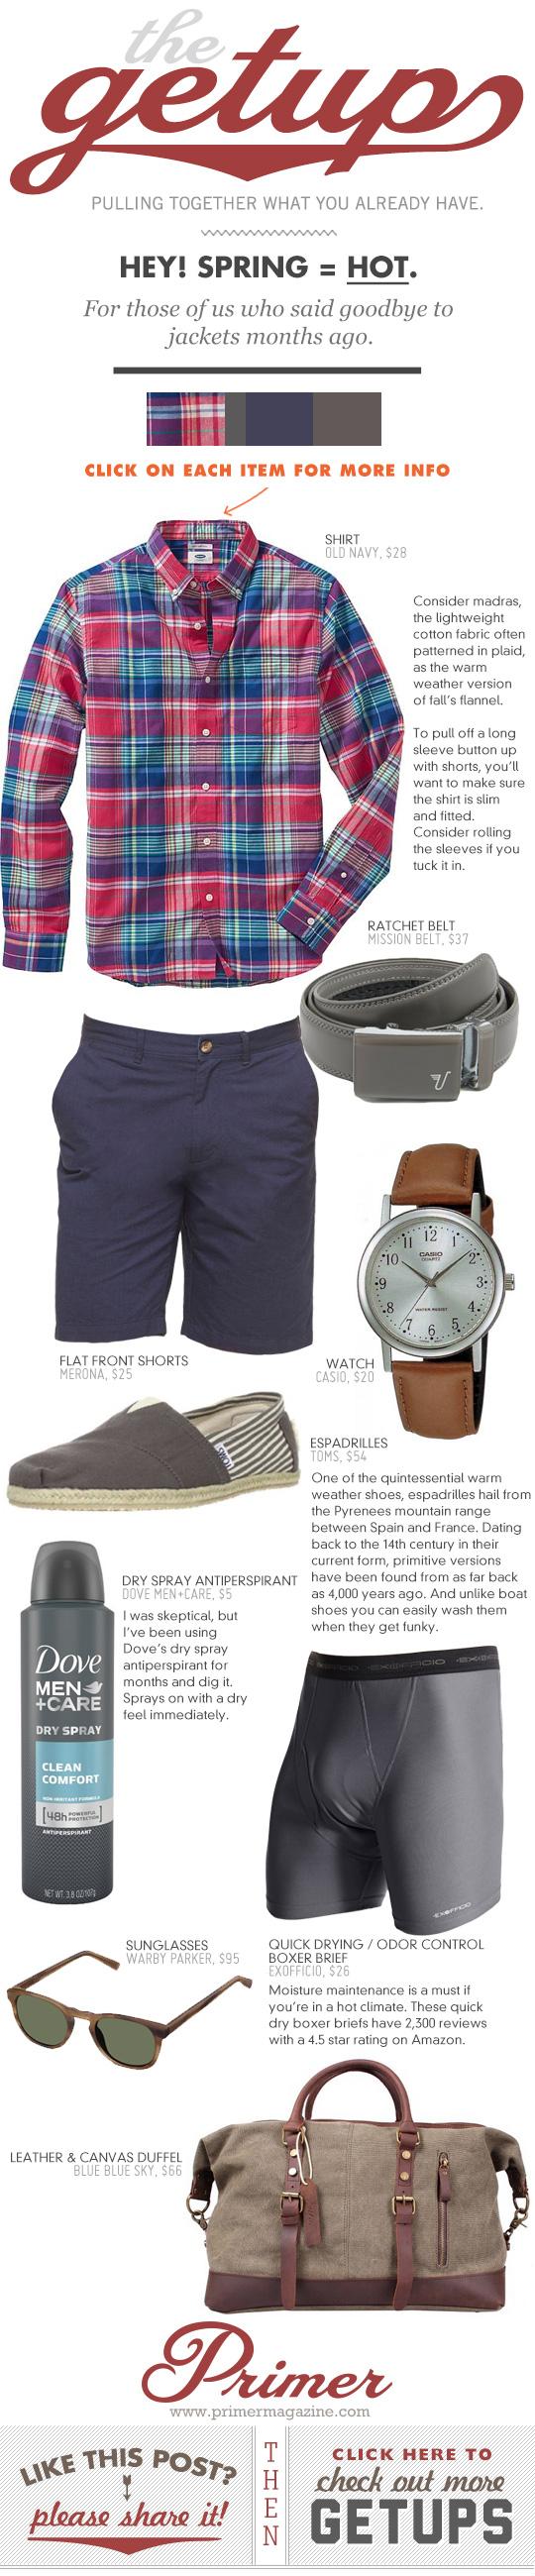 Getup - Spring equals hot - plaid shirt, navy shorts, gray espadrilles